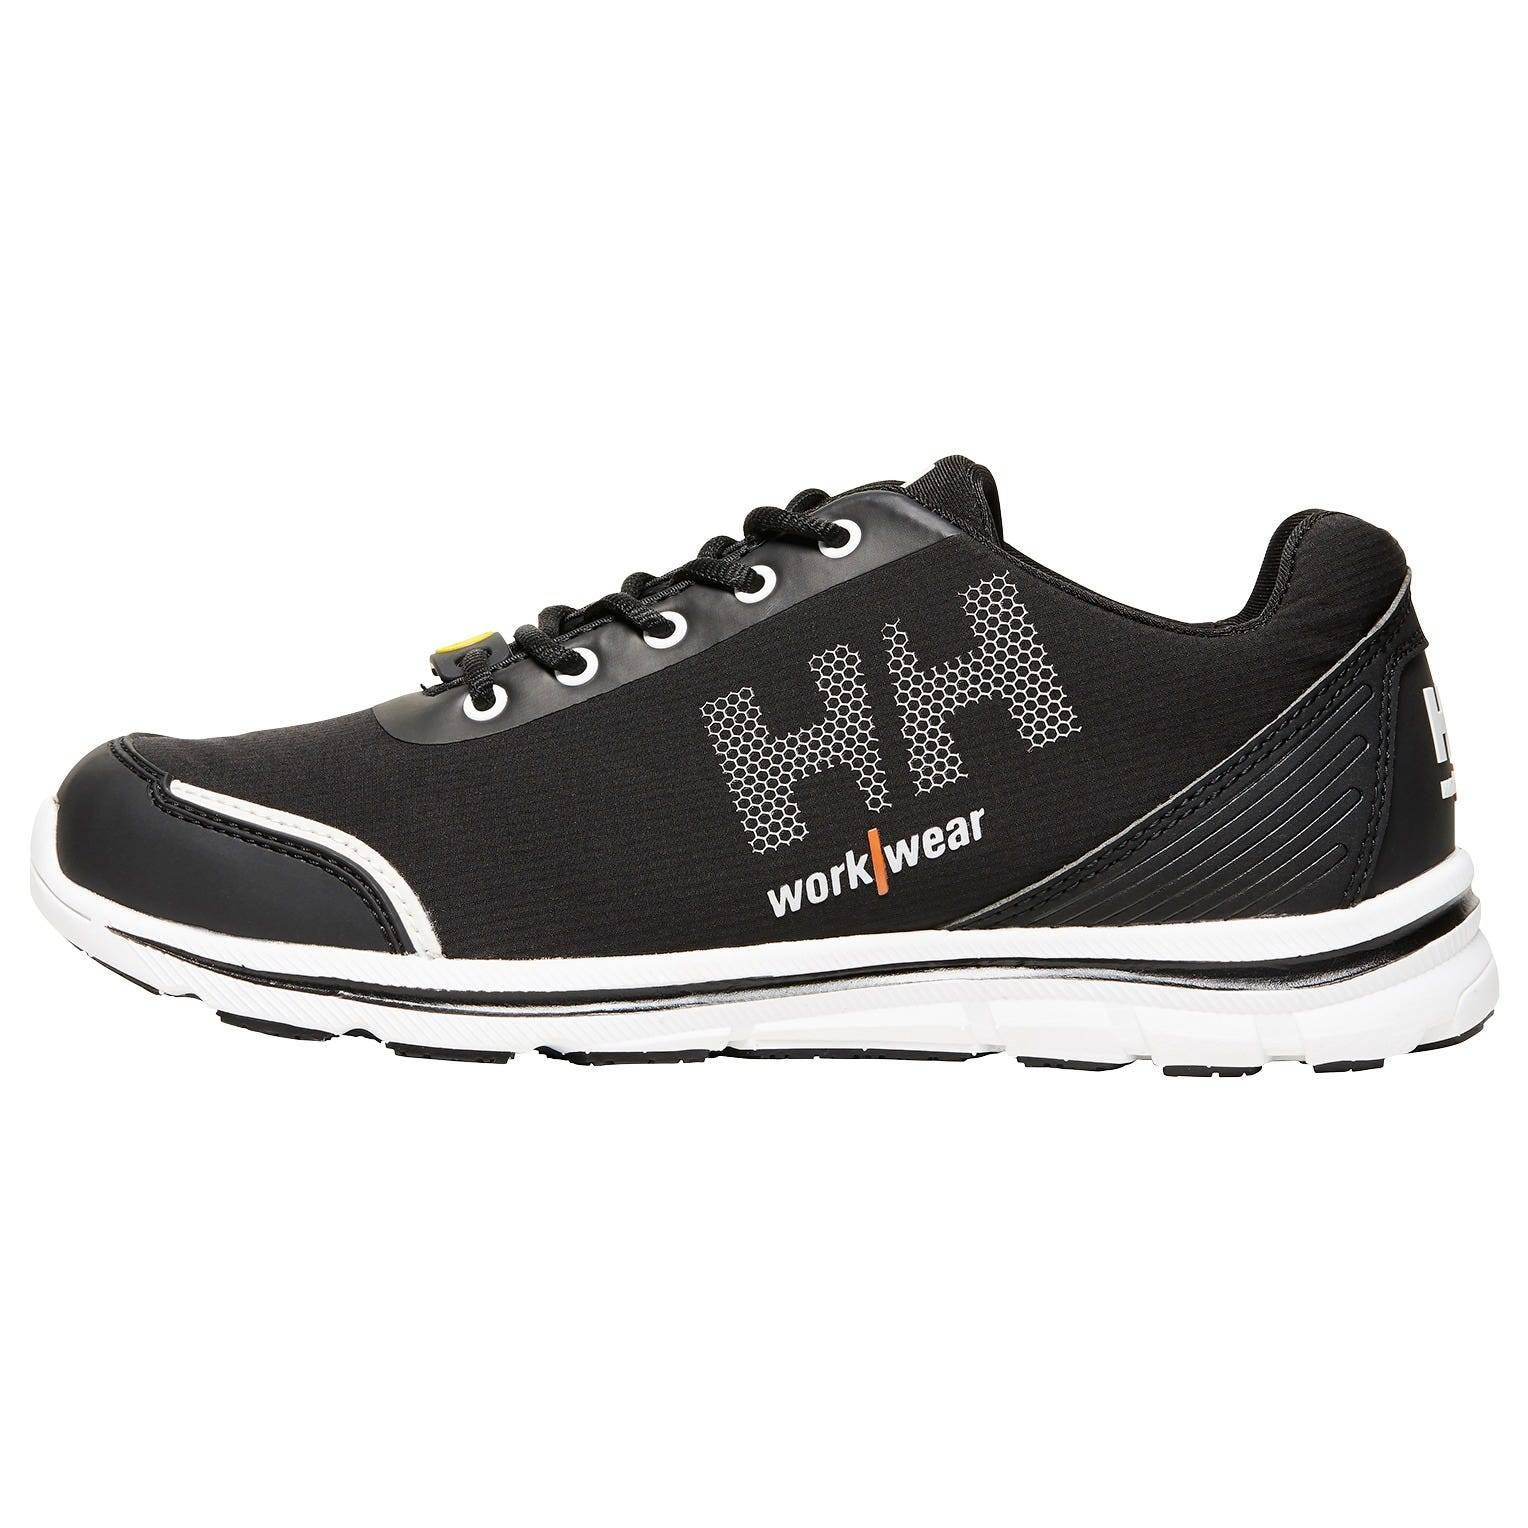 hh workwear workwear helly hansen scarpa antinfortunistica oslo st certificata o1 antiscivolo 46 nero